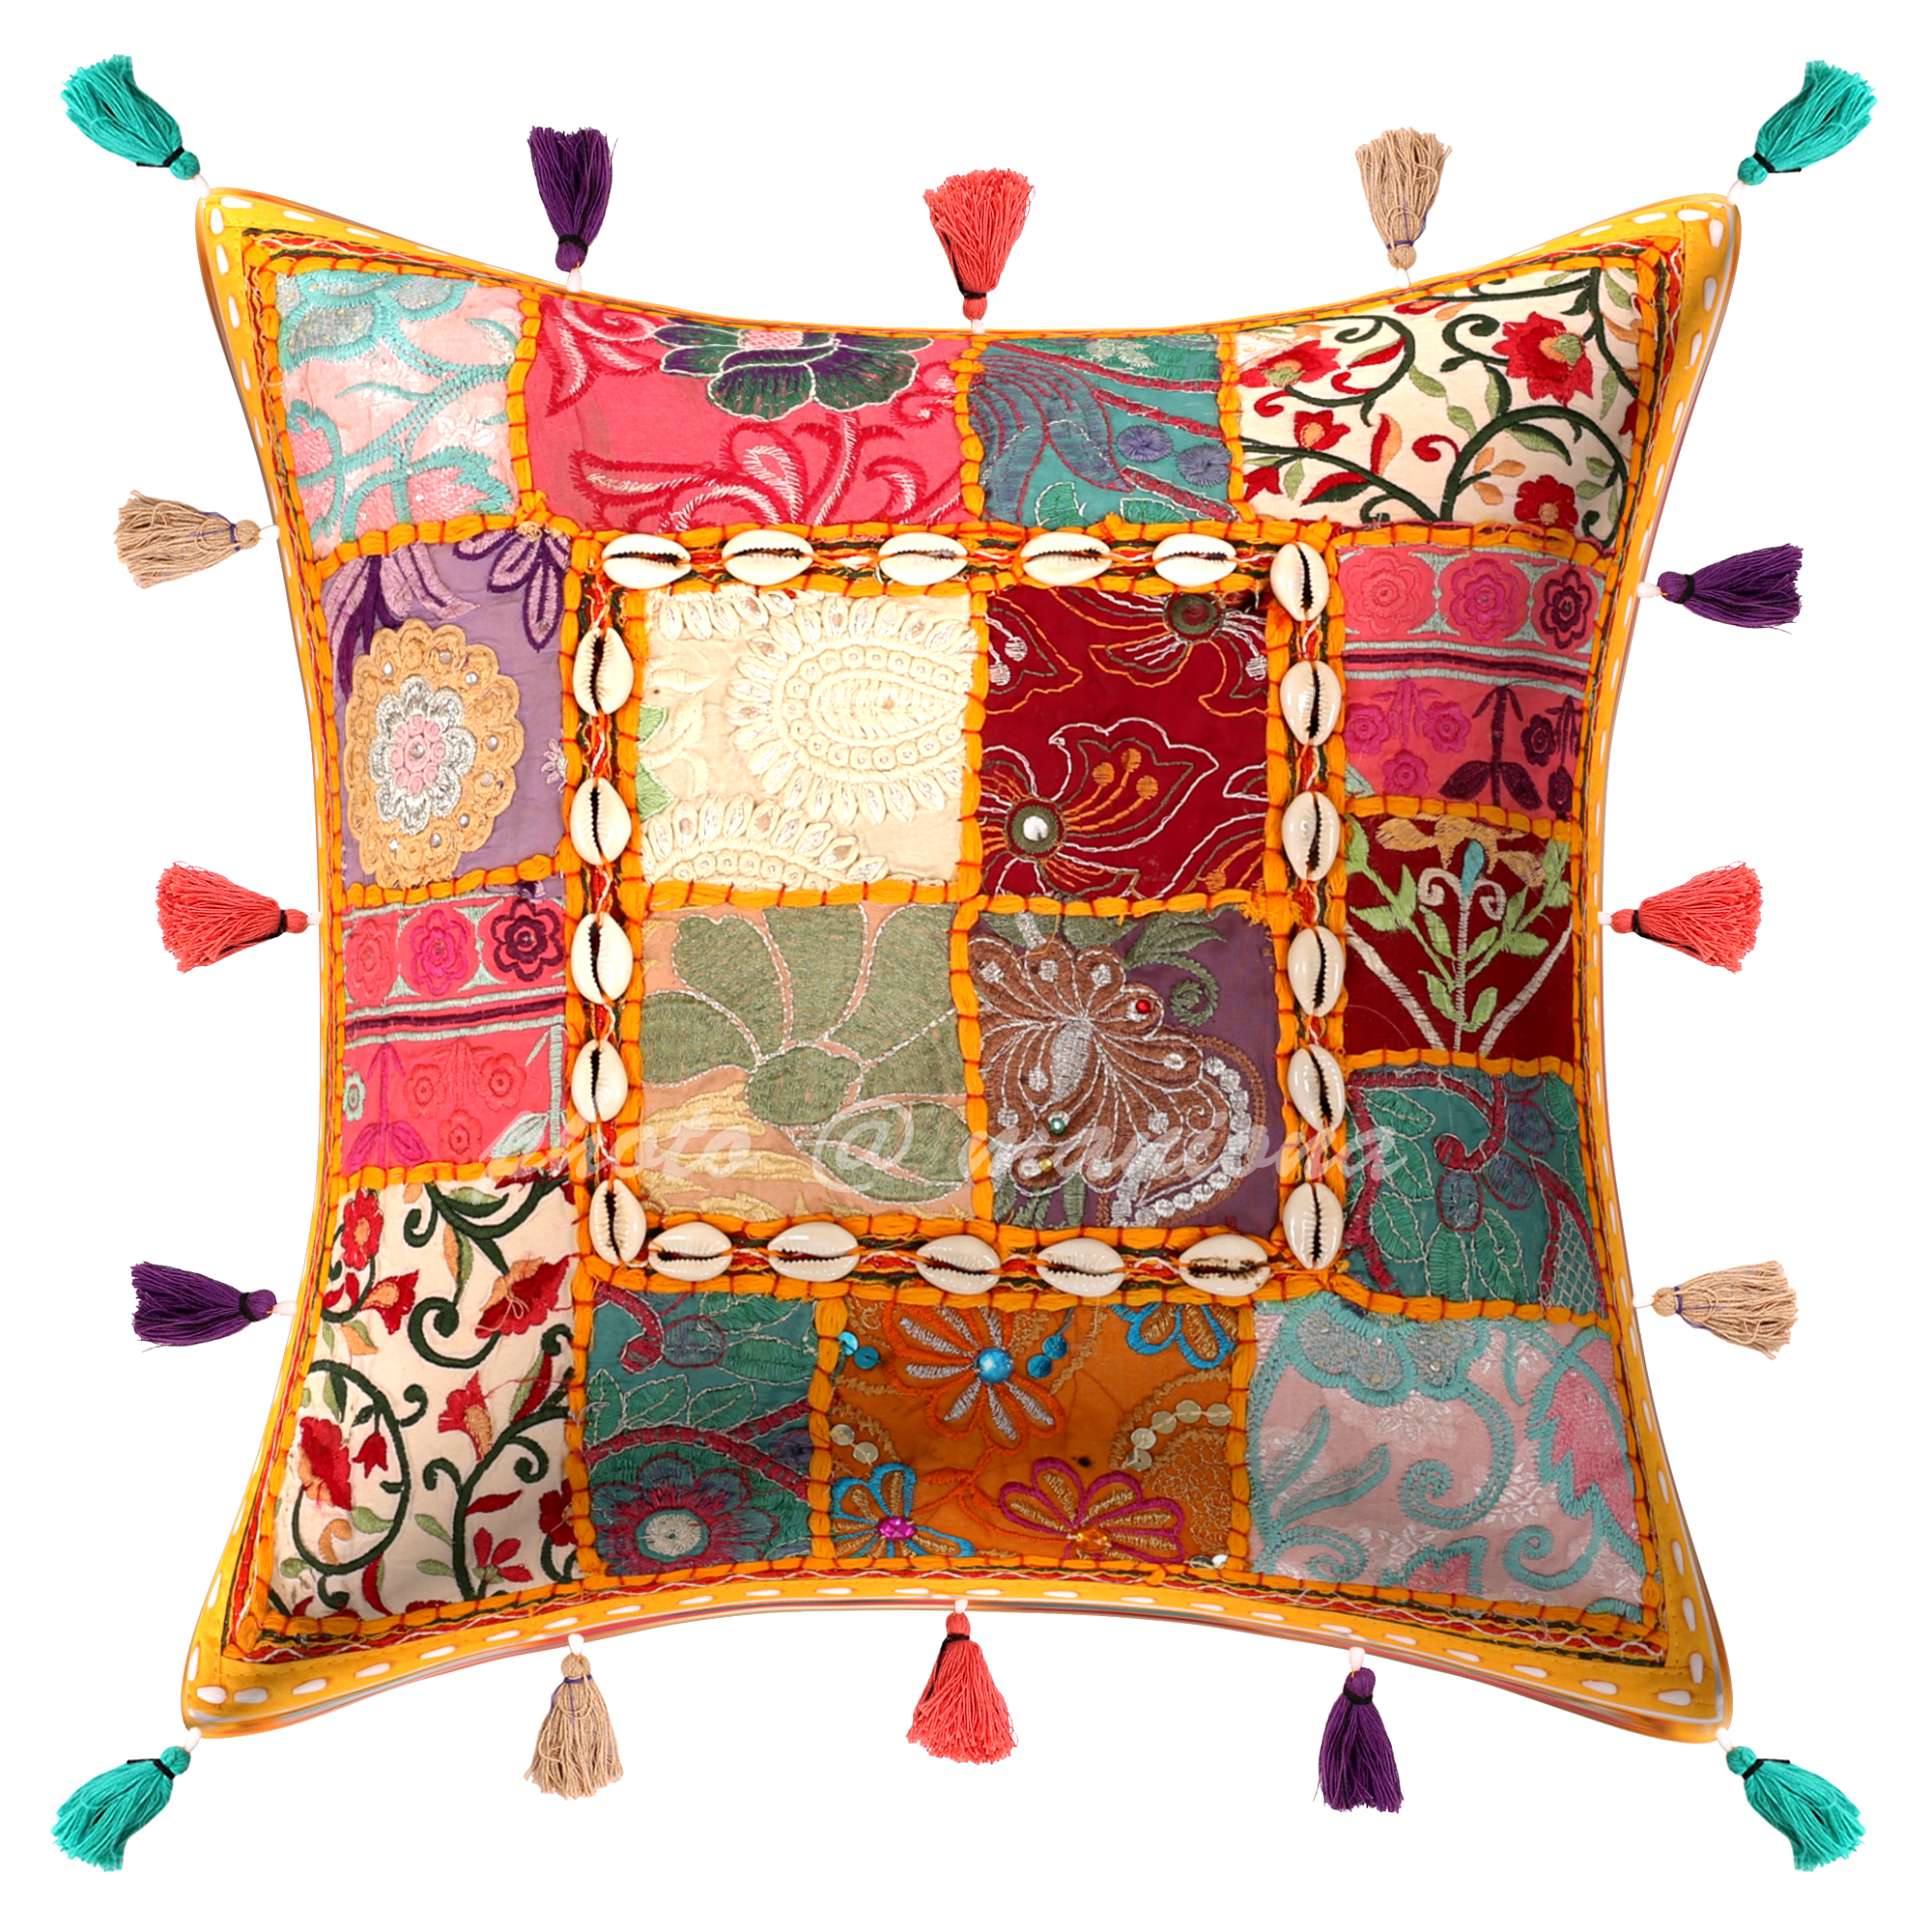 Ethnic Vintage Cushion Cover Indian Sari Patchwork Bohemian Decorative Pillow Cases 16 X 16